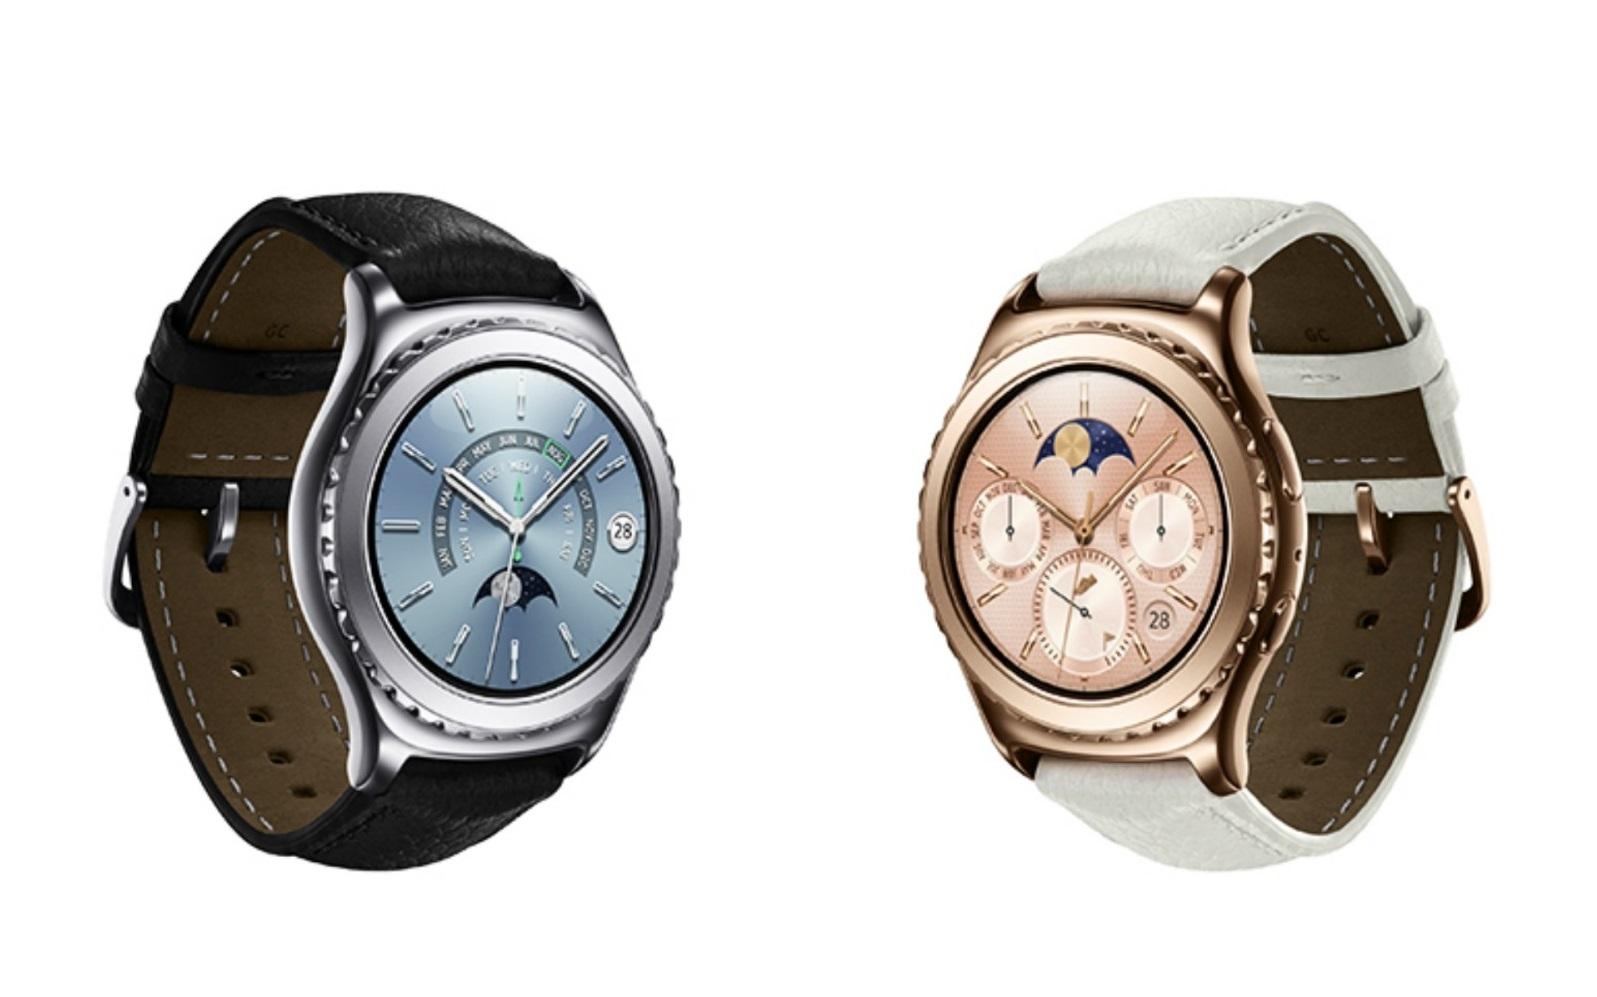 samsungs-gold-gear-s2-is-9500-cheaper-than-apple-watch-edition-image-cultofandroidcomwp-contentuploads201601Samsung-Gear-S2-Classic-Platinum-Rose-Gold-1600x1190-jpg